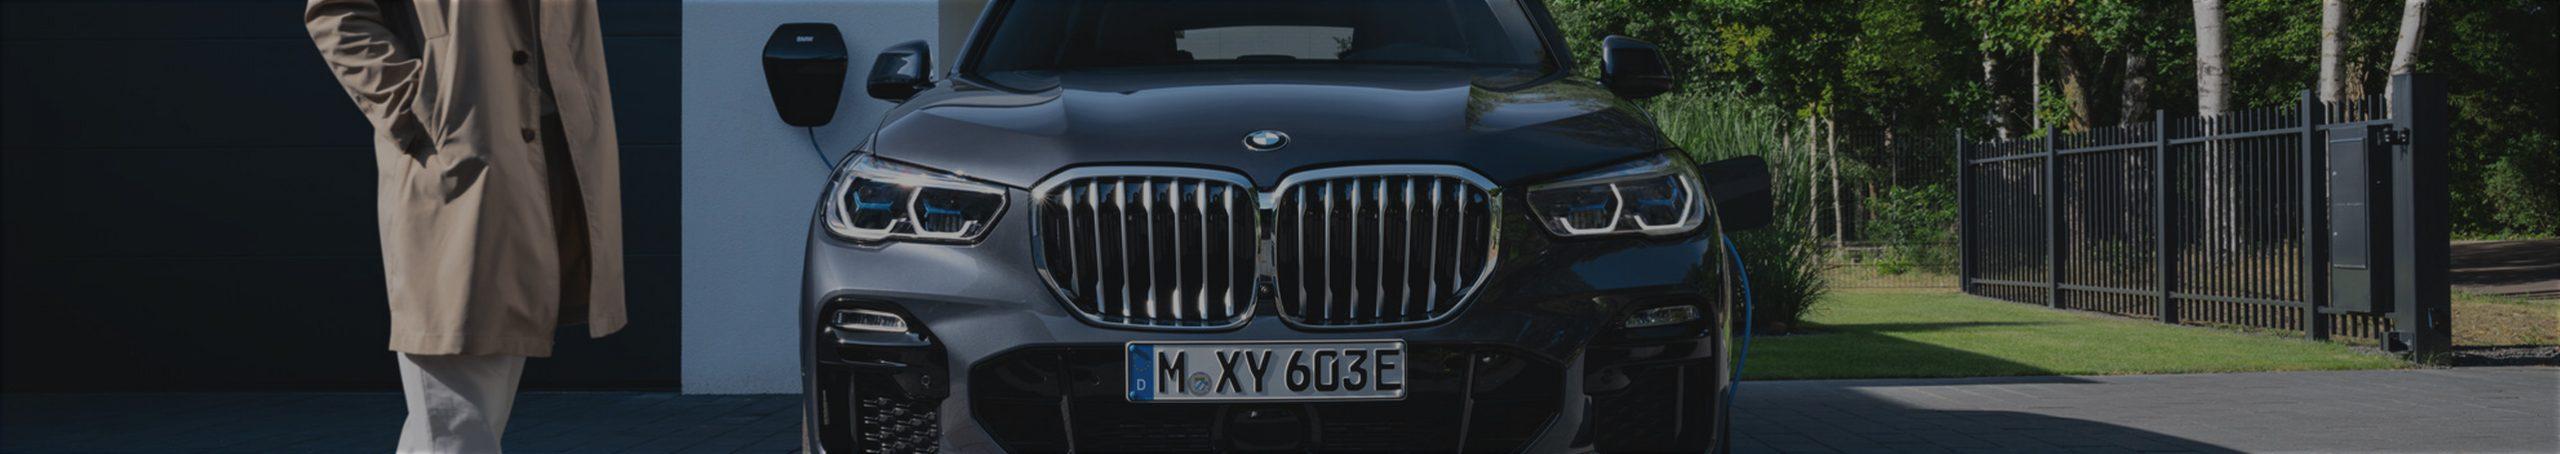 BMW-Flexleasing